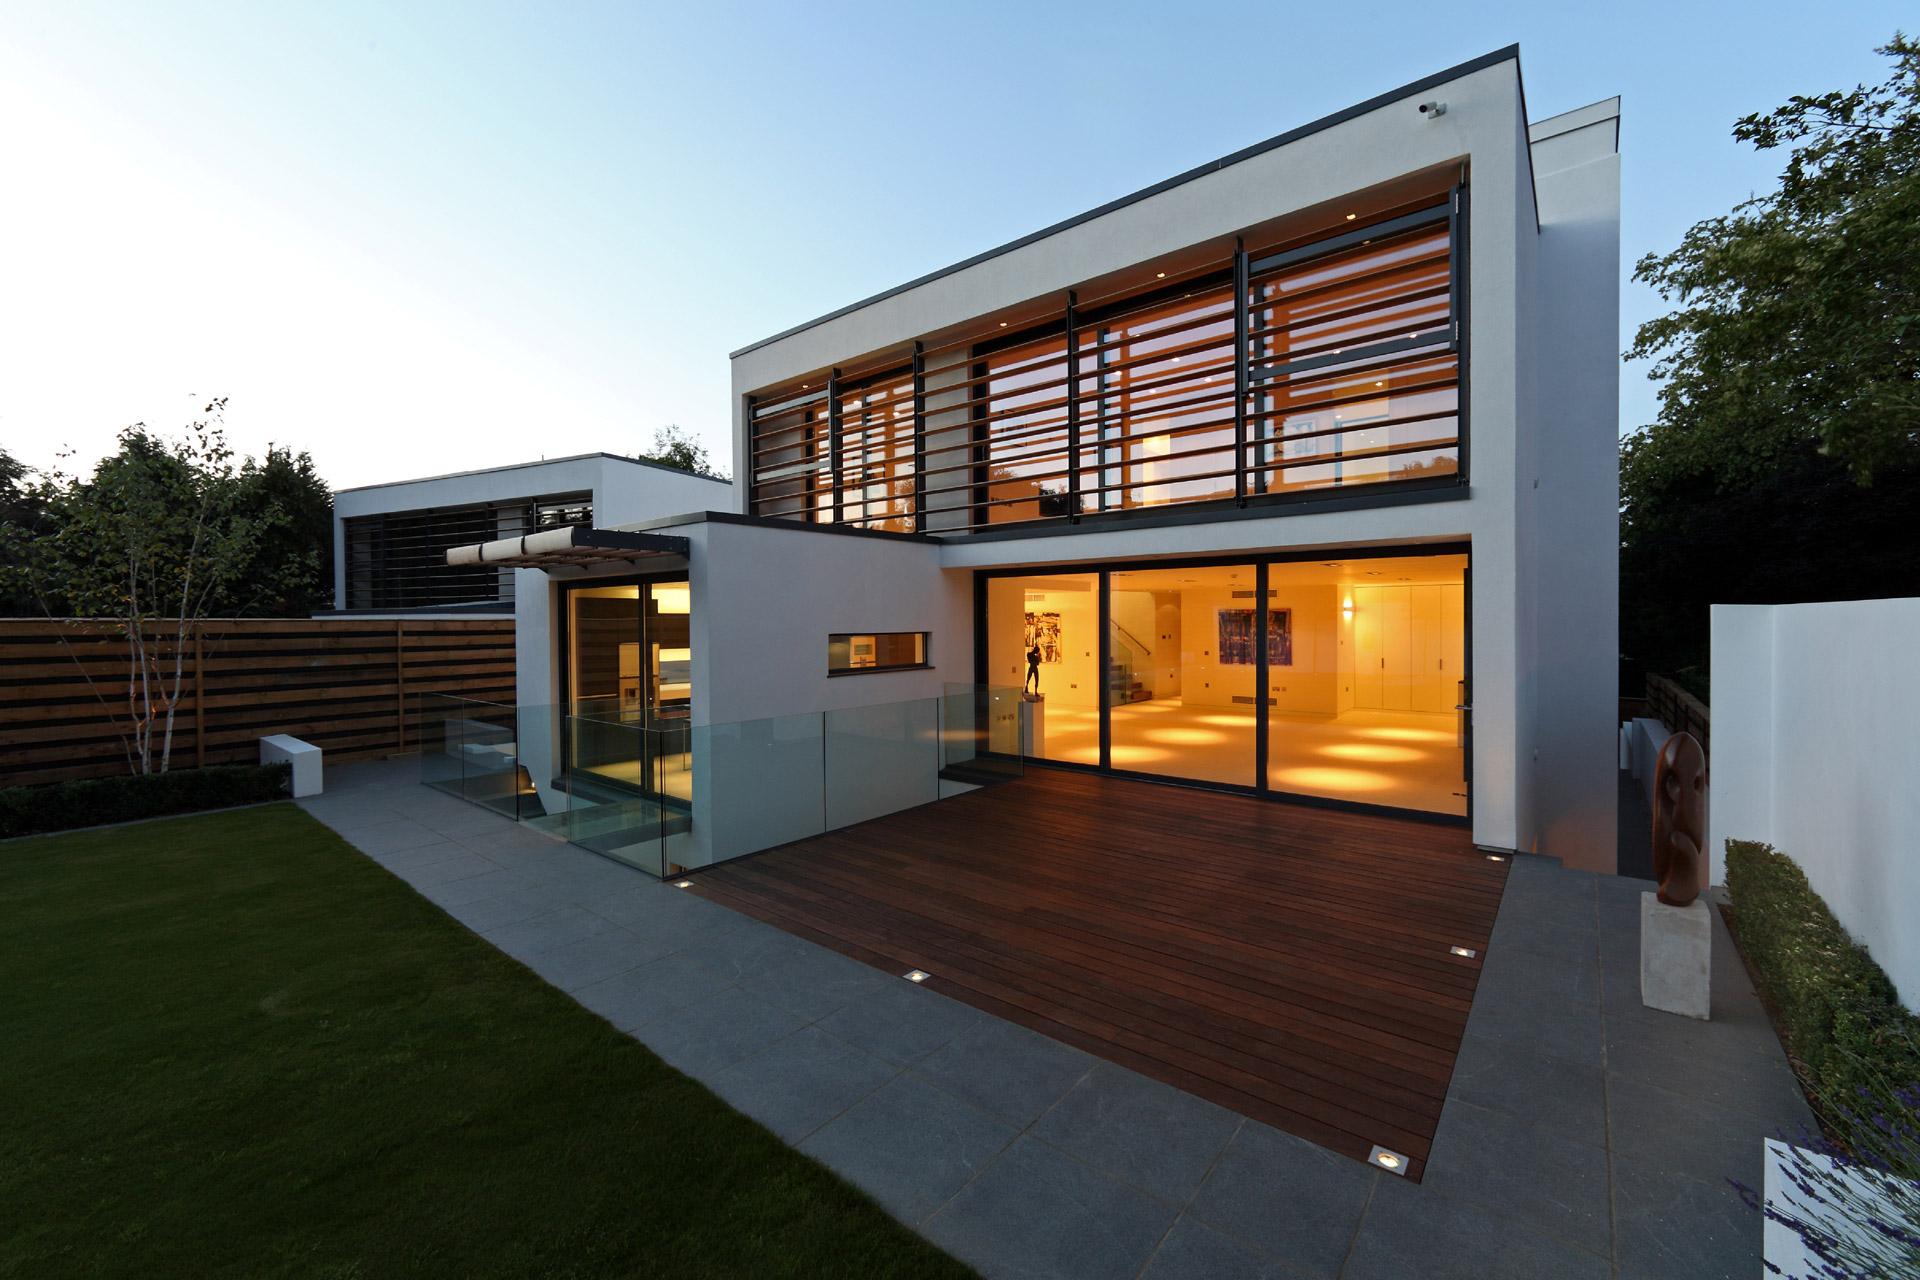 residential architecture residential architects london beds